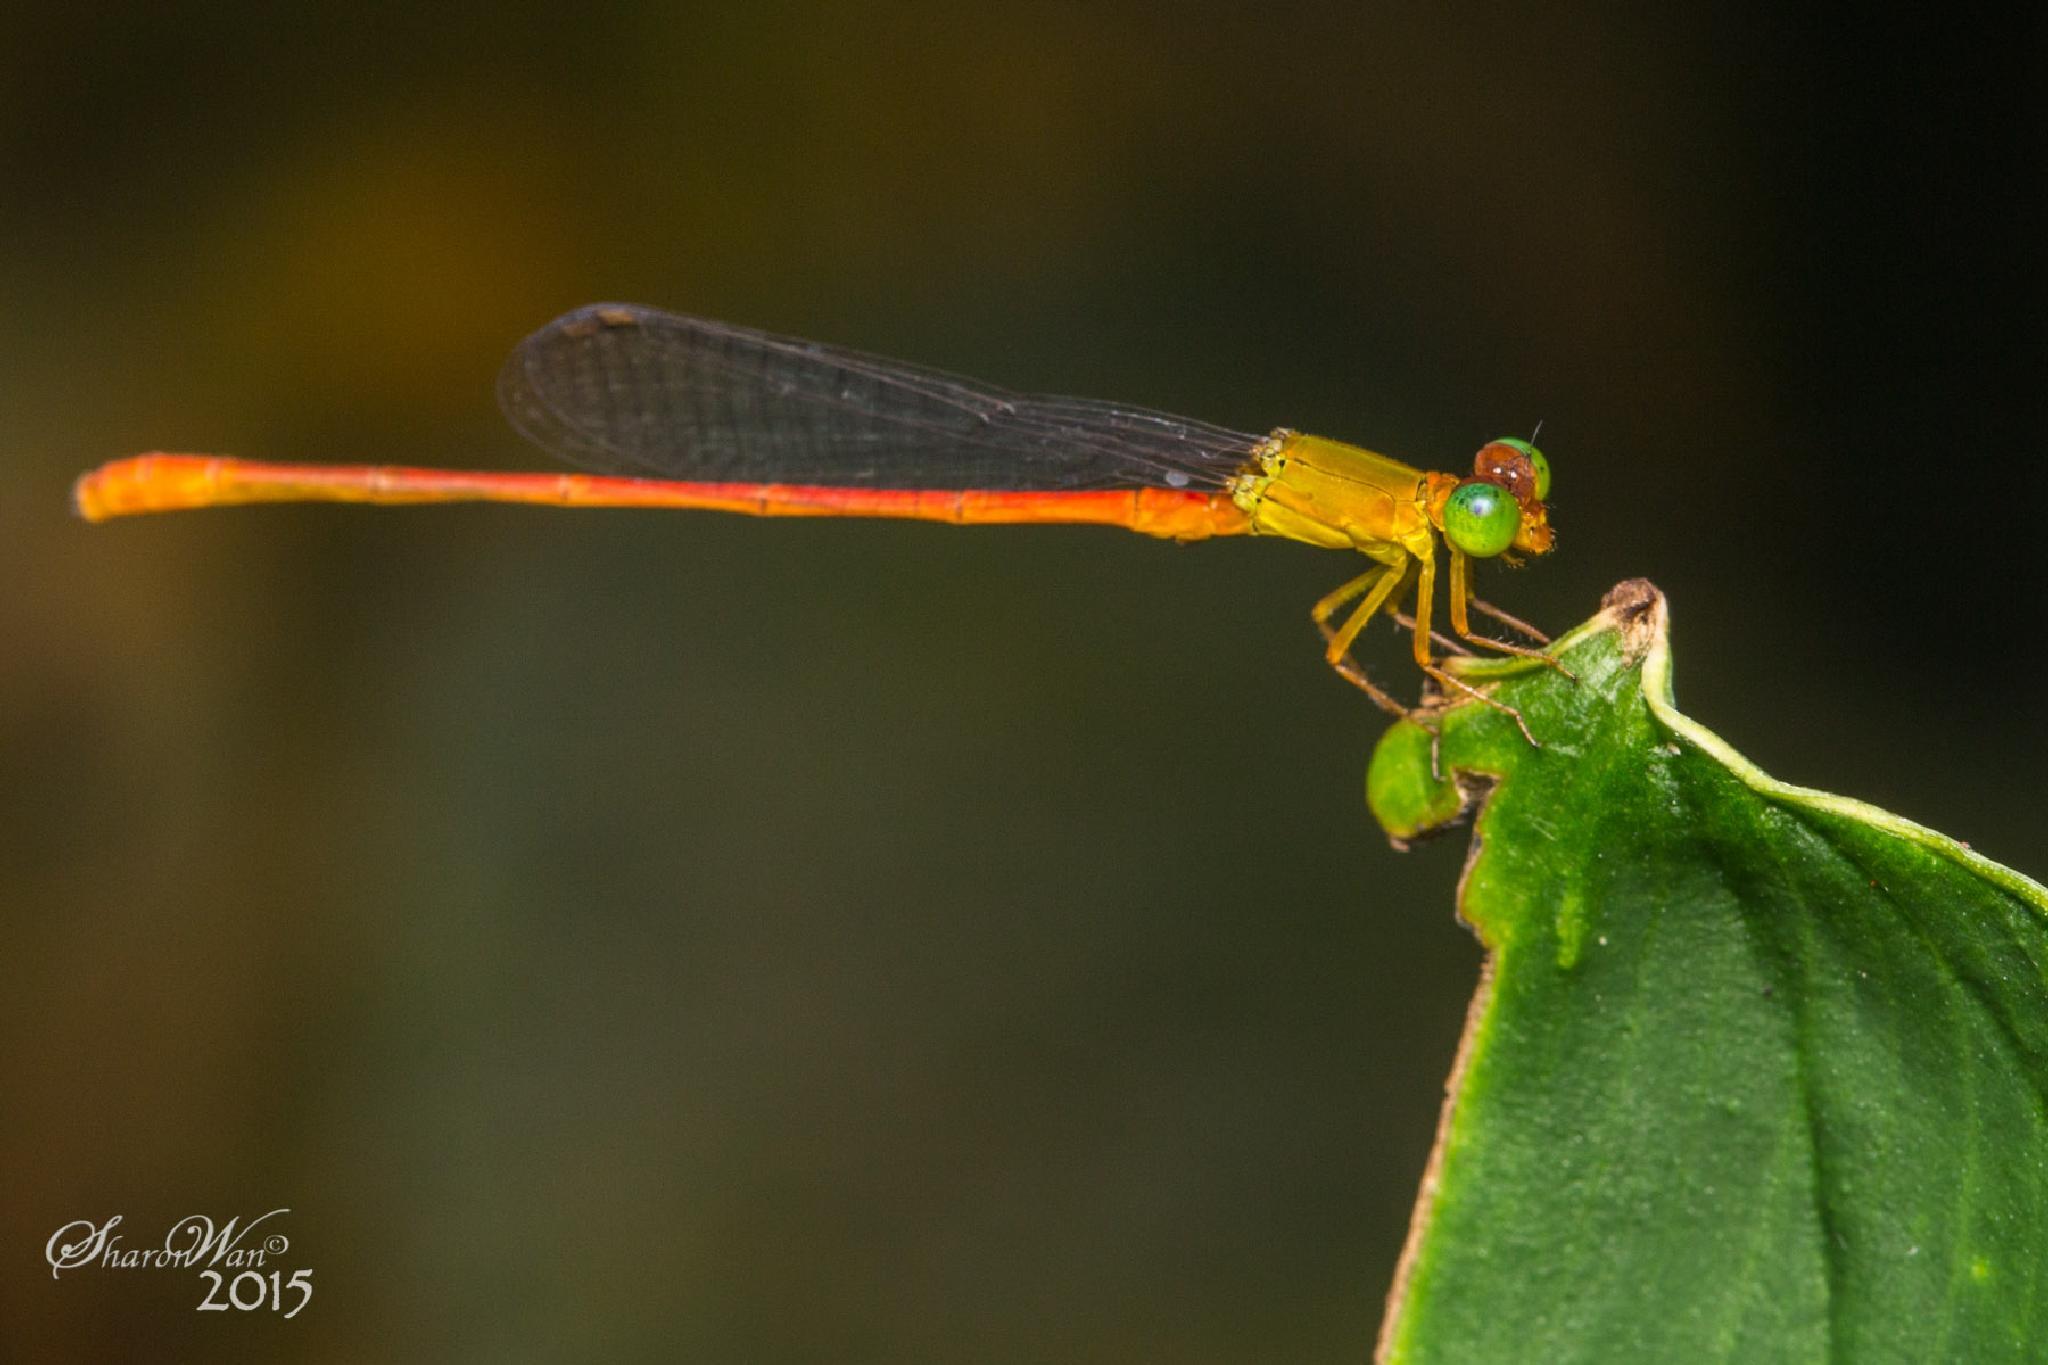 A tiny dragonfly by Sharon Wan